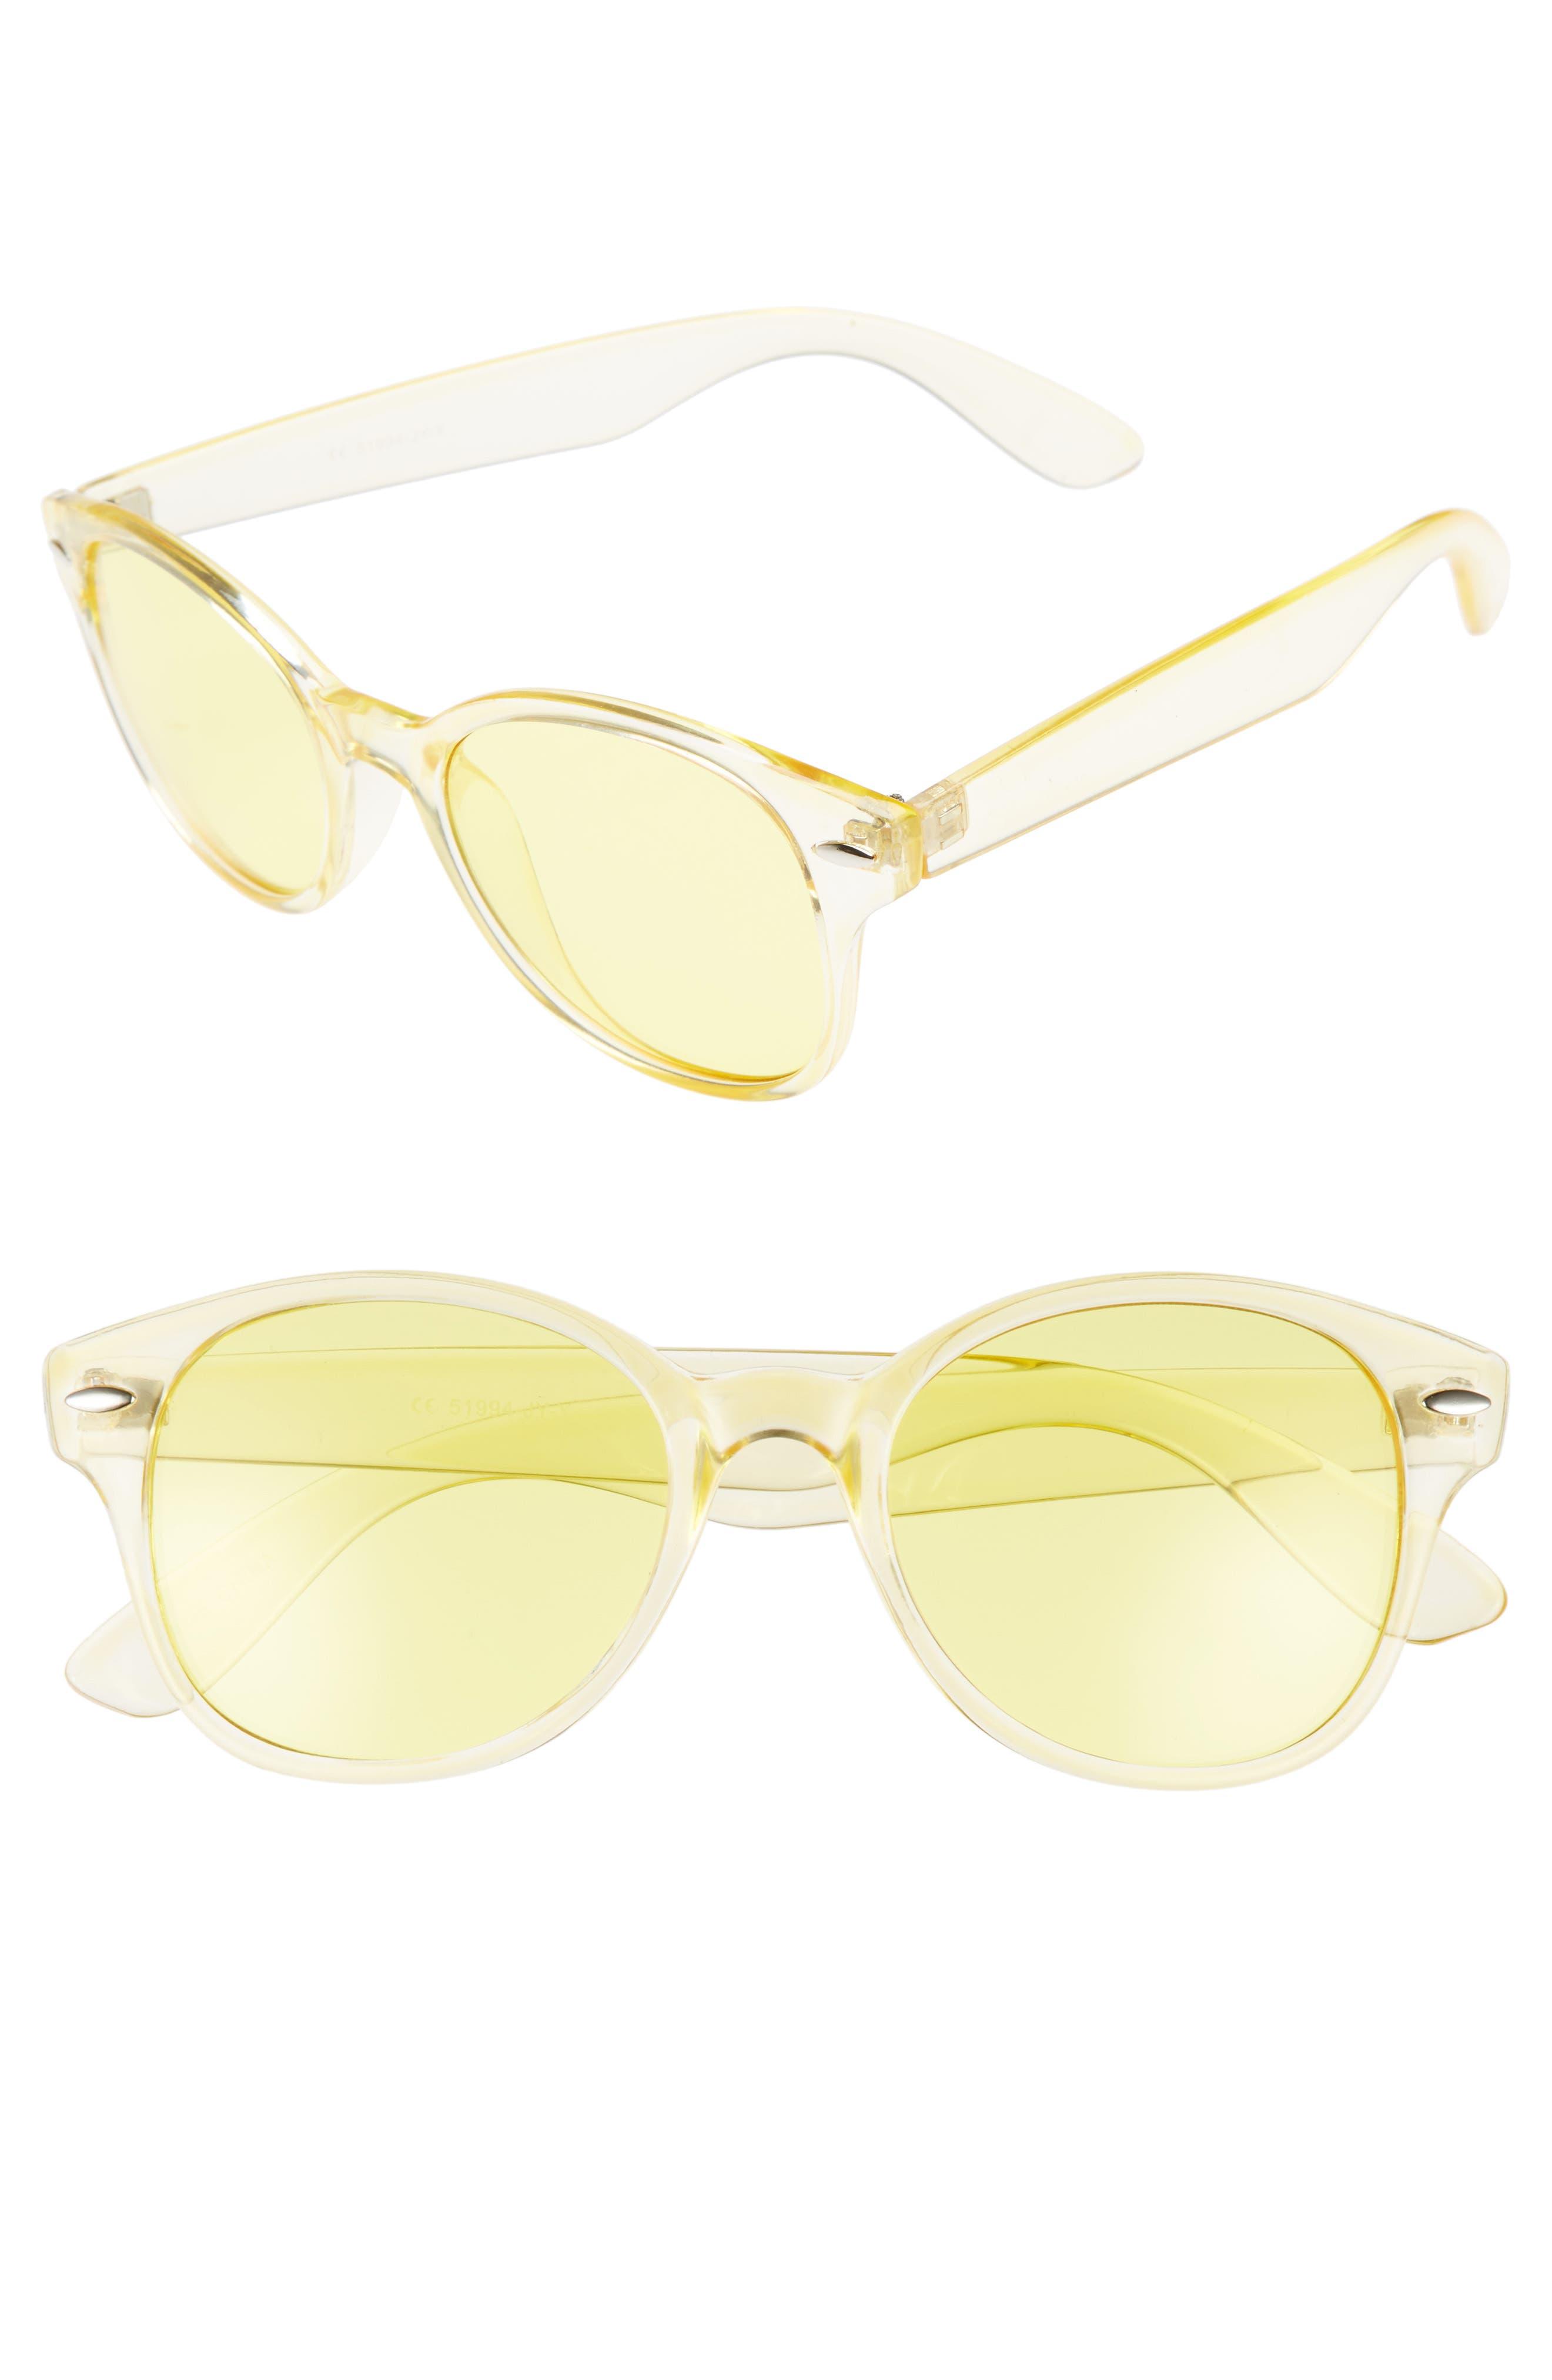 50mm Transparent Round Sunglasses,                             Main thumbnail 1, color,